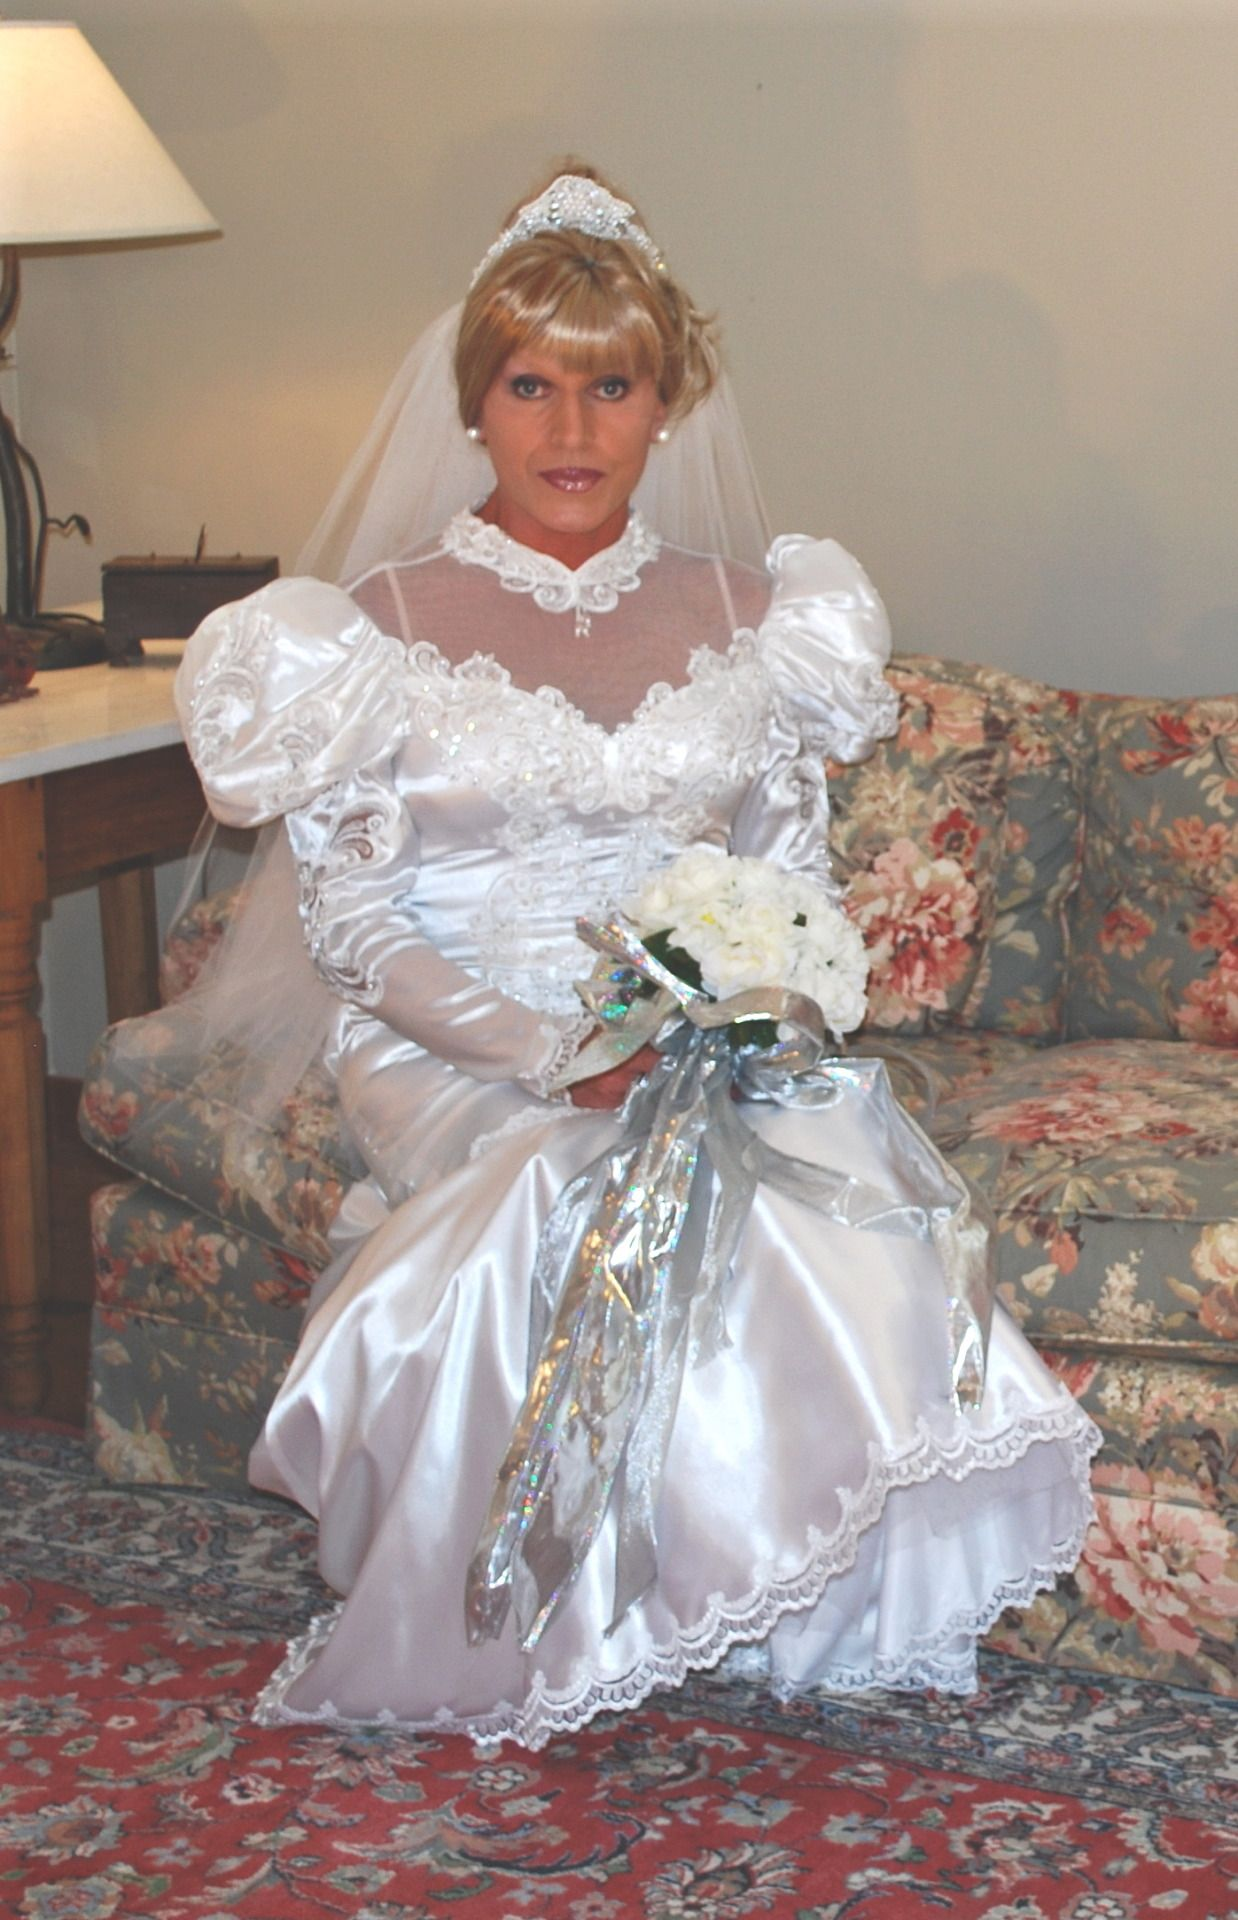 My big fat gypsy wedding dress with lights  crossoverdress uc Lisa Colette Thomas ud  Satin  Pinterest